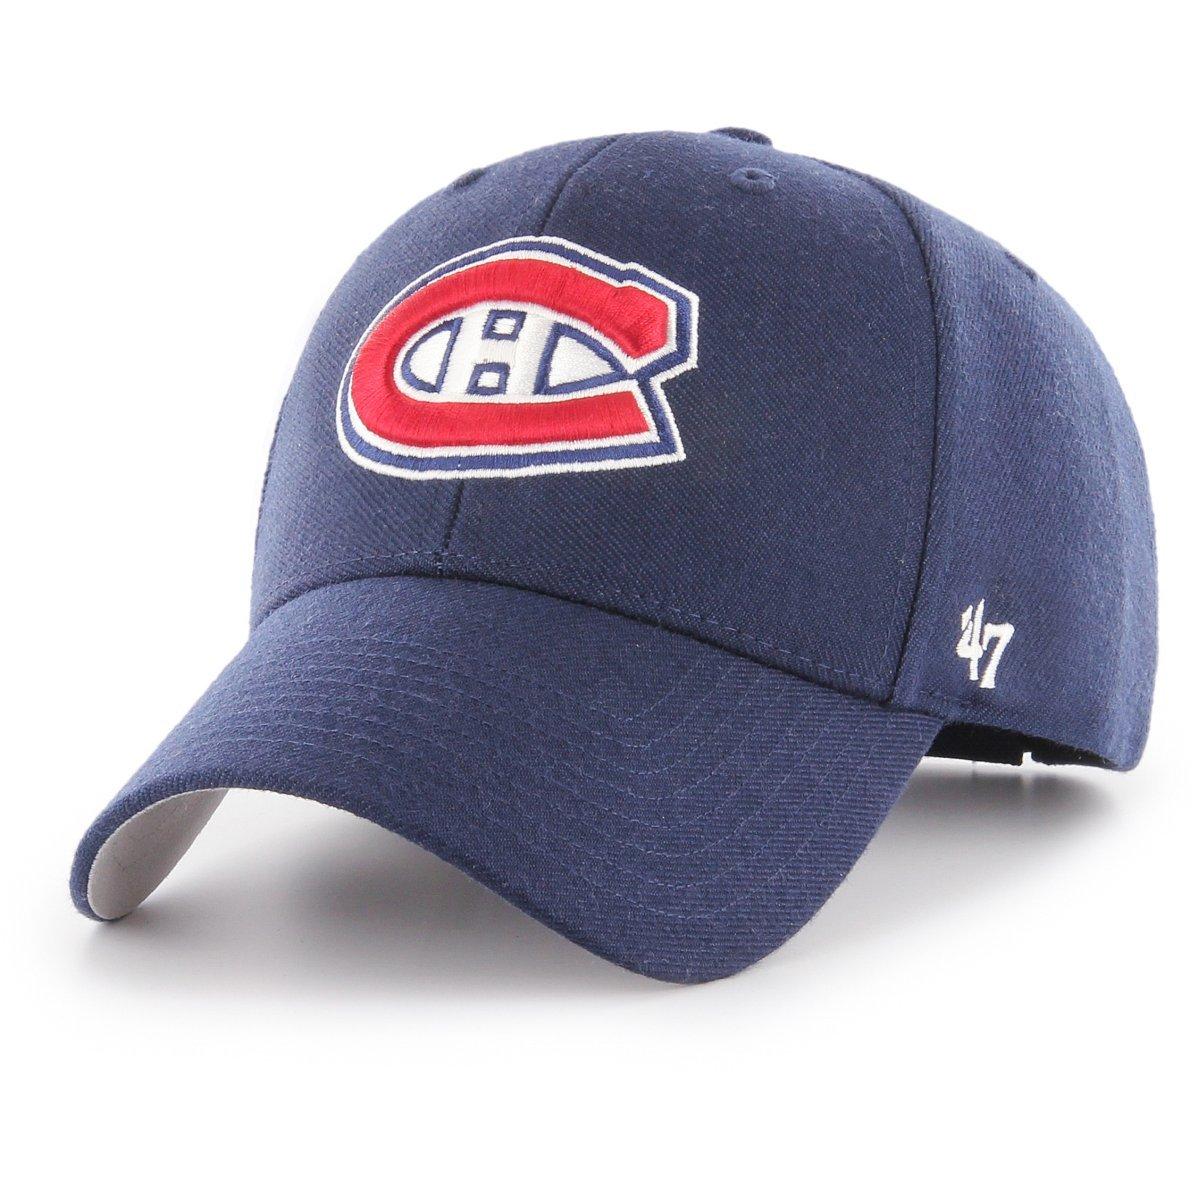 '47 NHL Montreal Canadiens '47 MVP Cap 47 Brand